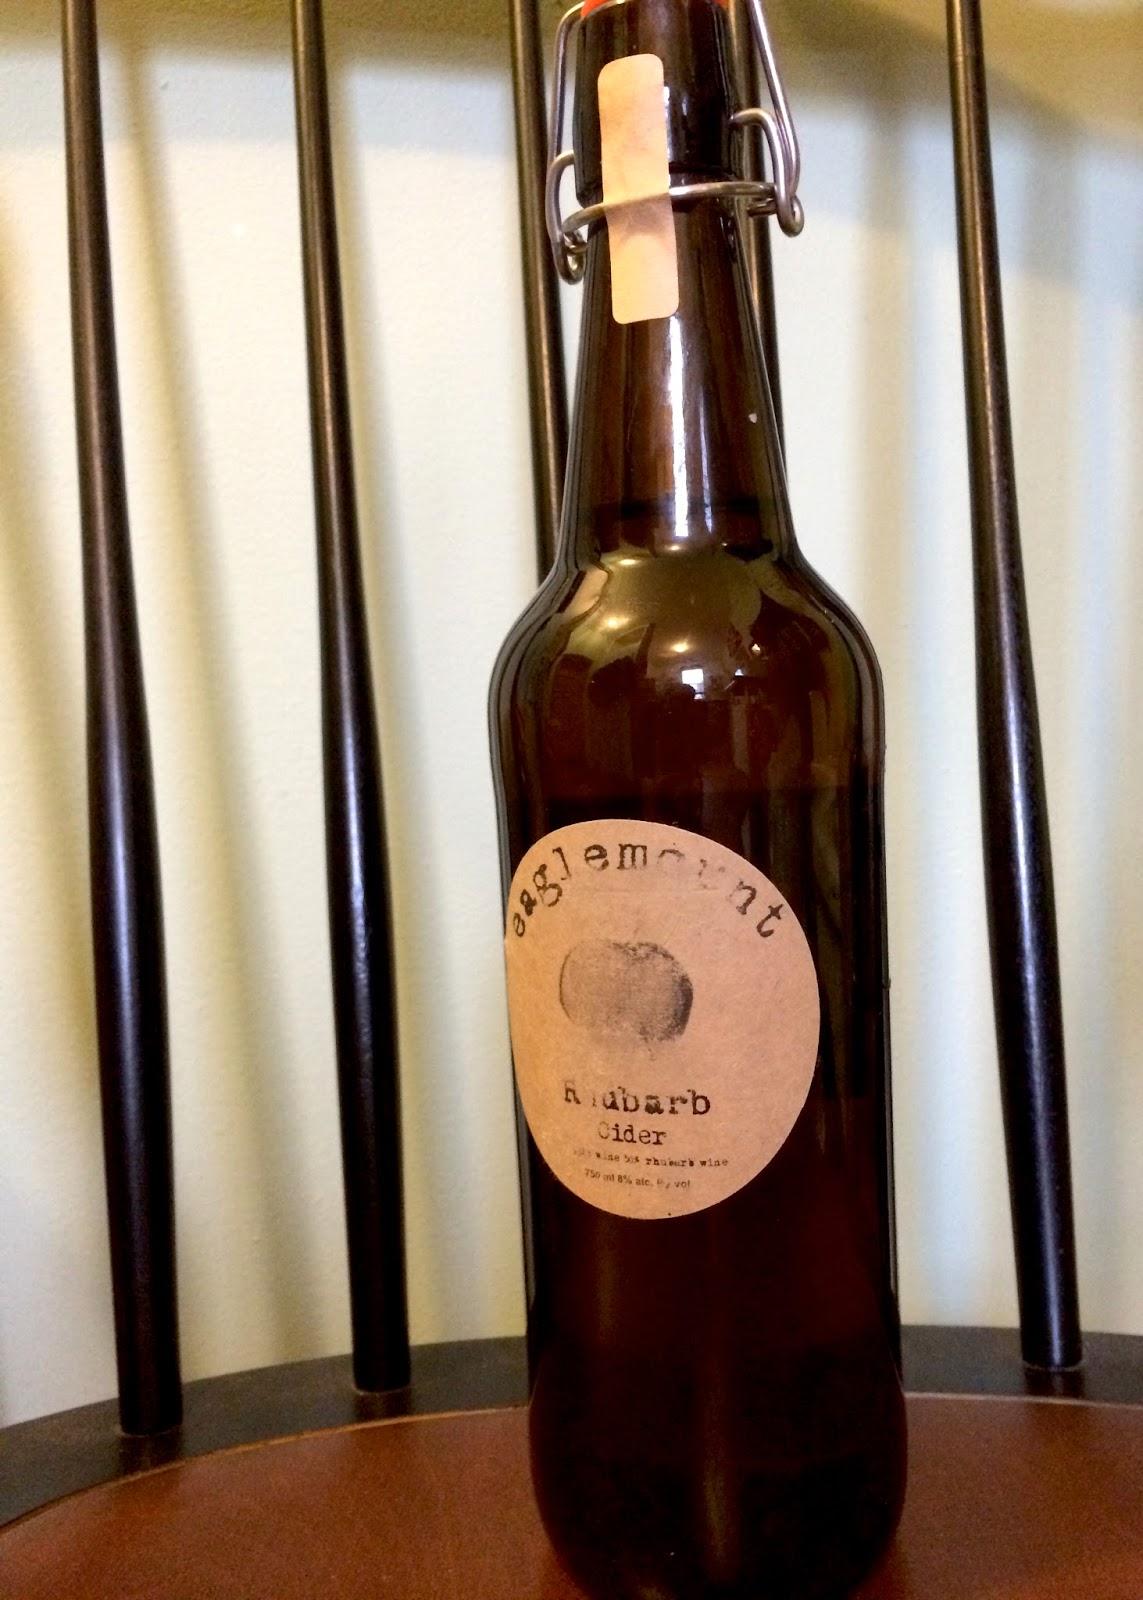 Eaglemount Wine & Cider - 18 Photos & 14 Reviews - Wine ...